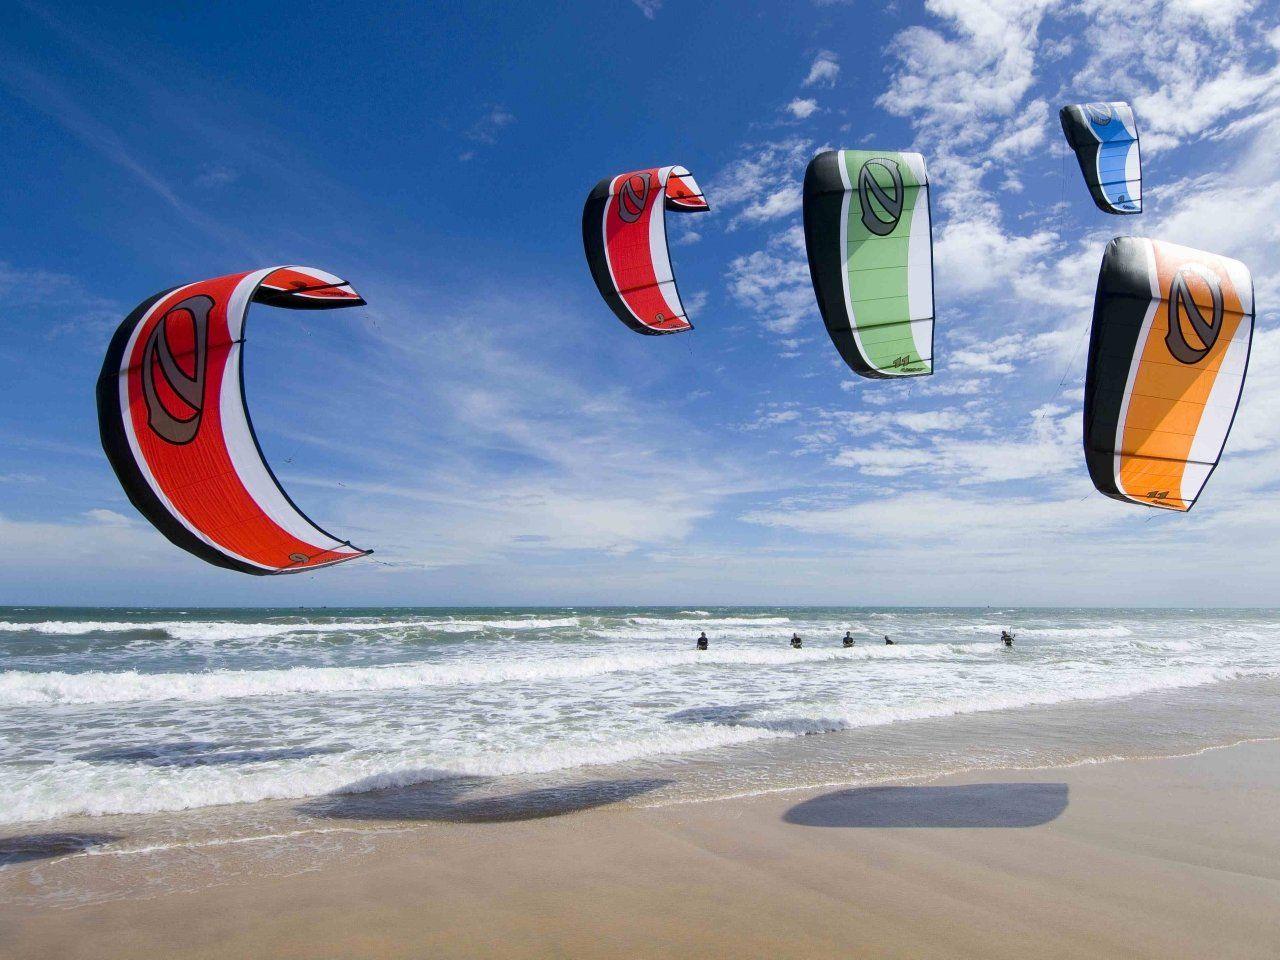 Download Freeride kitesurfing wallpaper A nice little Naish Kites